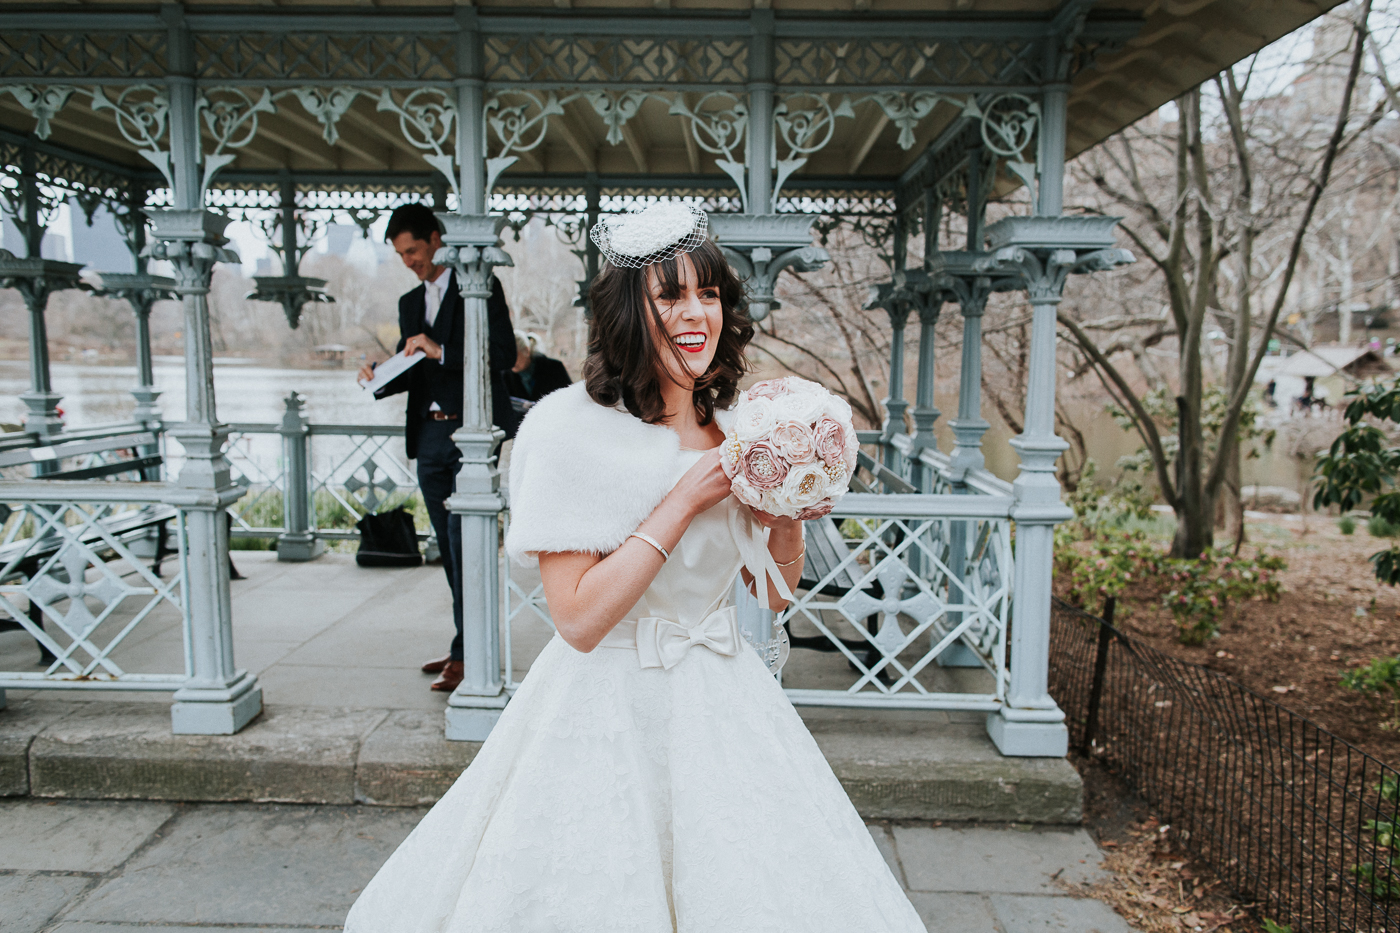 Ladies-Pavilion-Central-Park-NYC-Documentary-Elopement-Wedding-Photographer-39.jpg